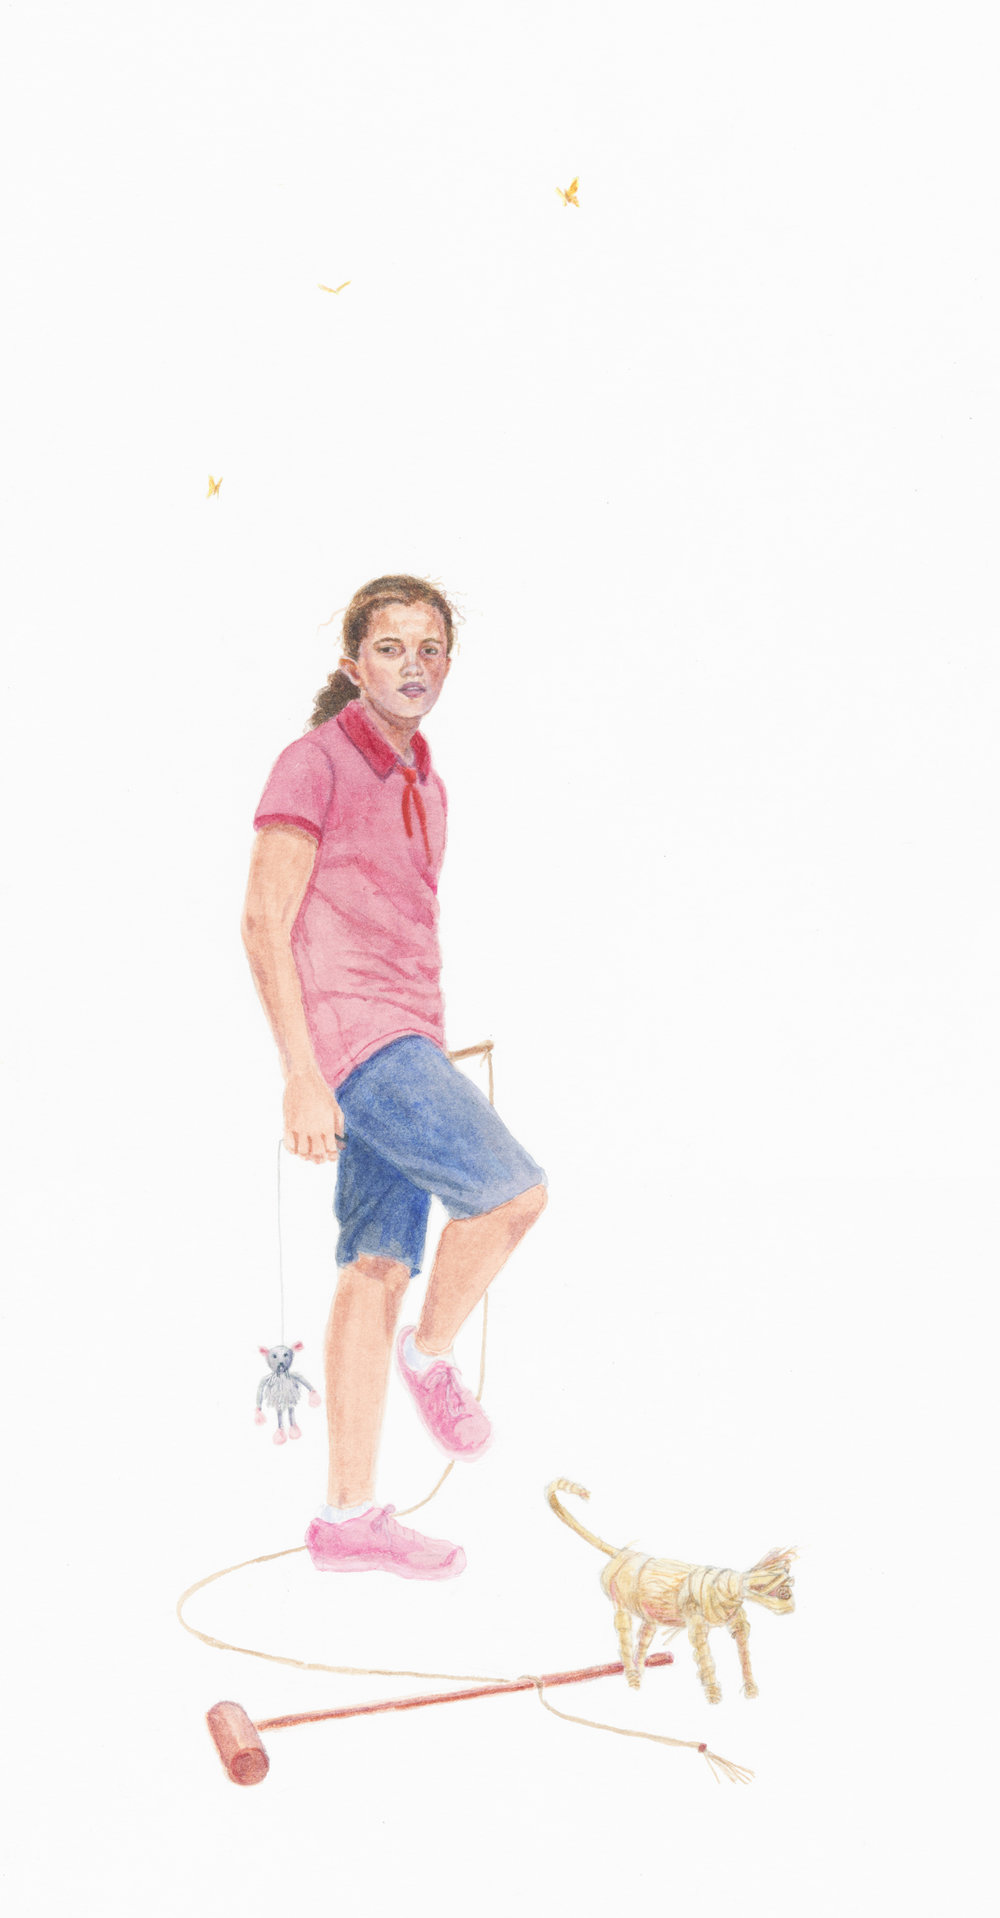 "Stalker, 15"" x 8"", watercolor & gouache on paper, 2014"